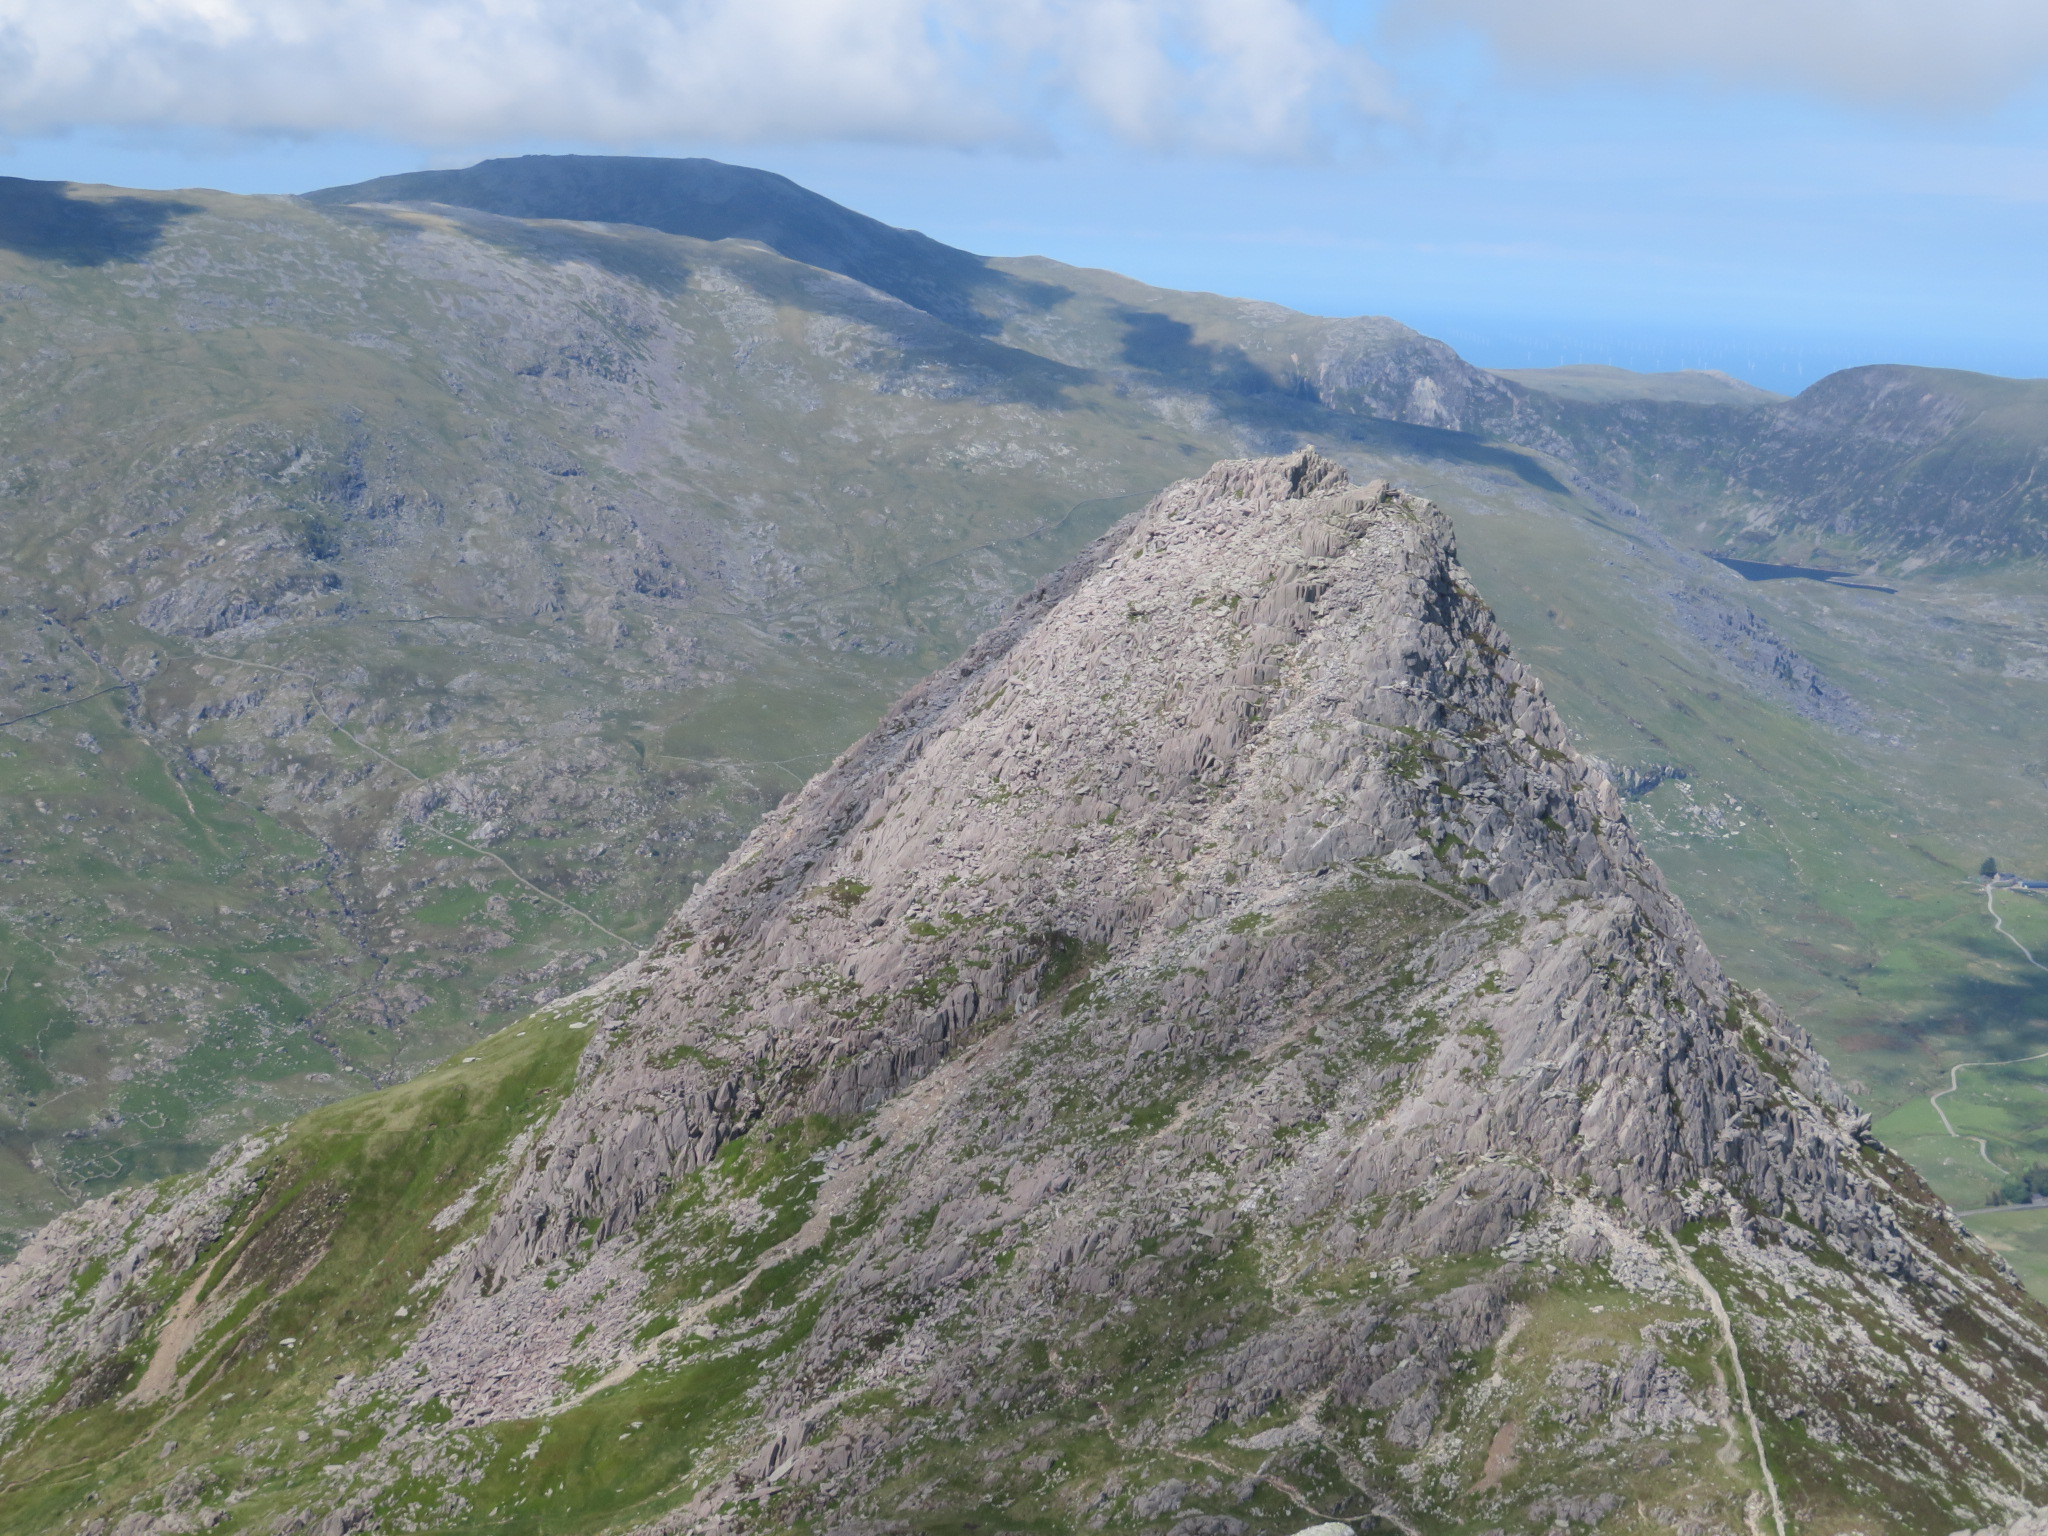 United Kingdom Wales Snowdonia, Glyderau from Pen-y-Pass, Tryfan from Glyder Fach, Walkopedia